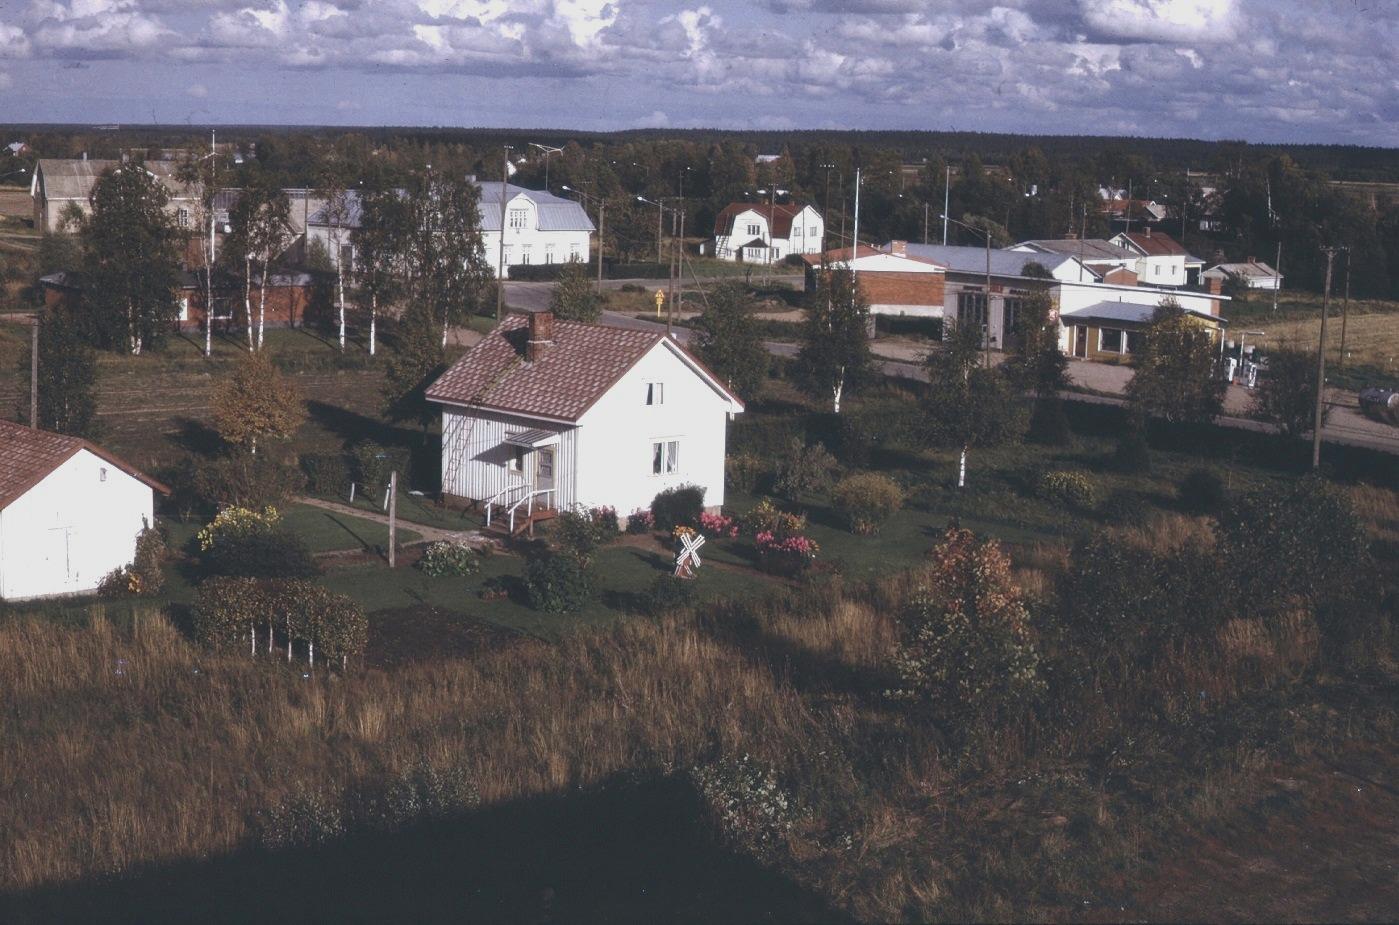 Dagsmark Centrum fotograferat 1974 då ett egnahemshus byggts ovanpå grunden till det nedbrunna sparbankshuset.